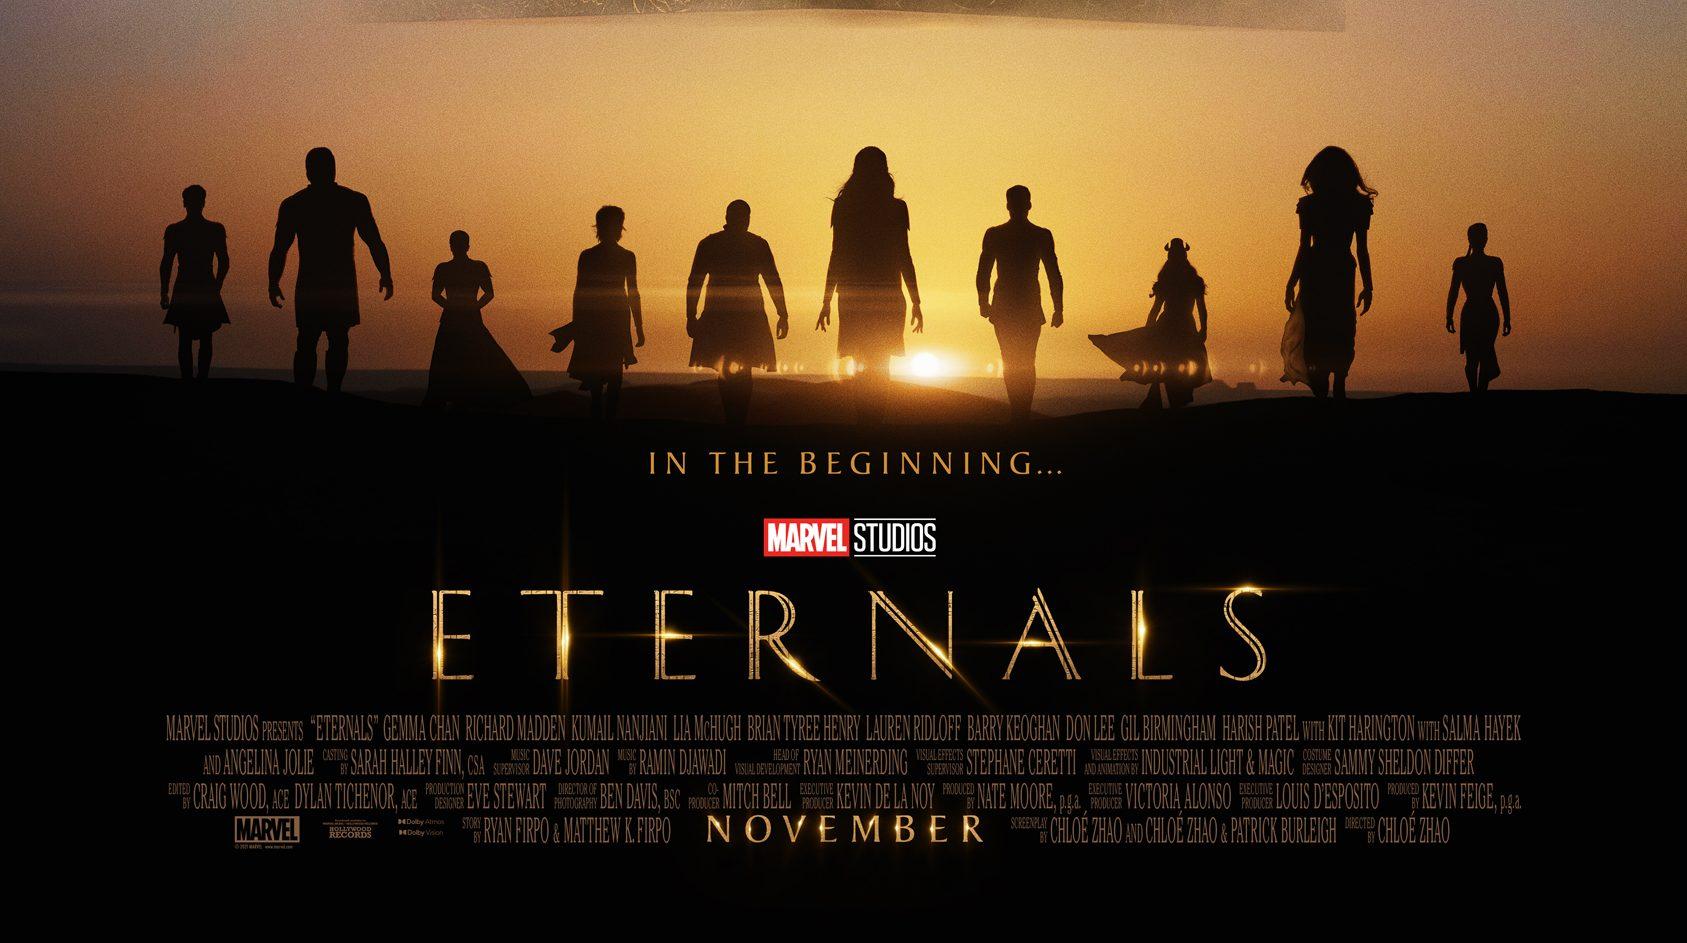 Eternals' Trailer Clocks 77M Views, Tops For A Marvel Movie During Pandemic – Deadline